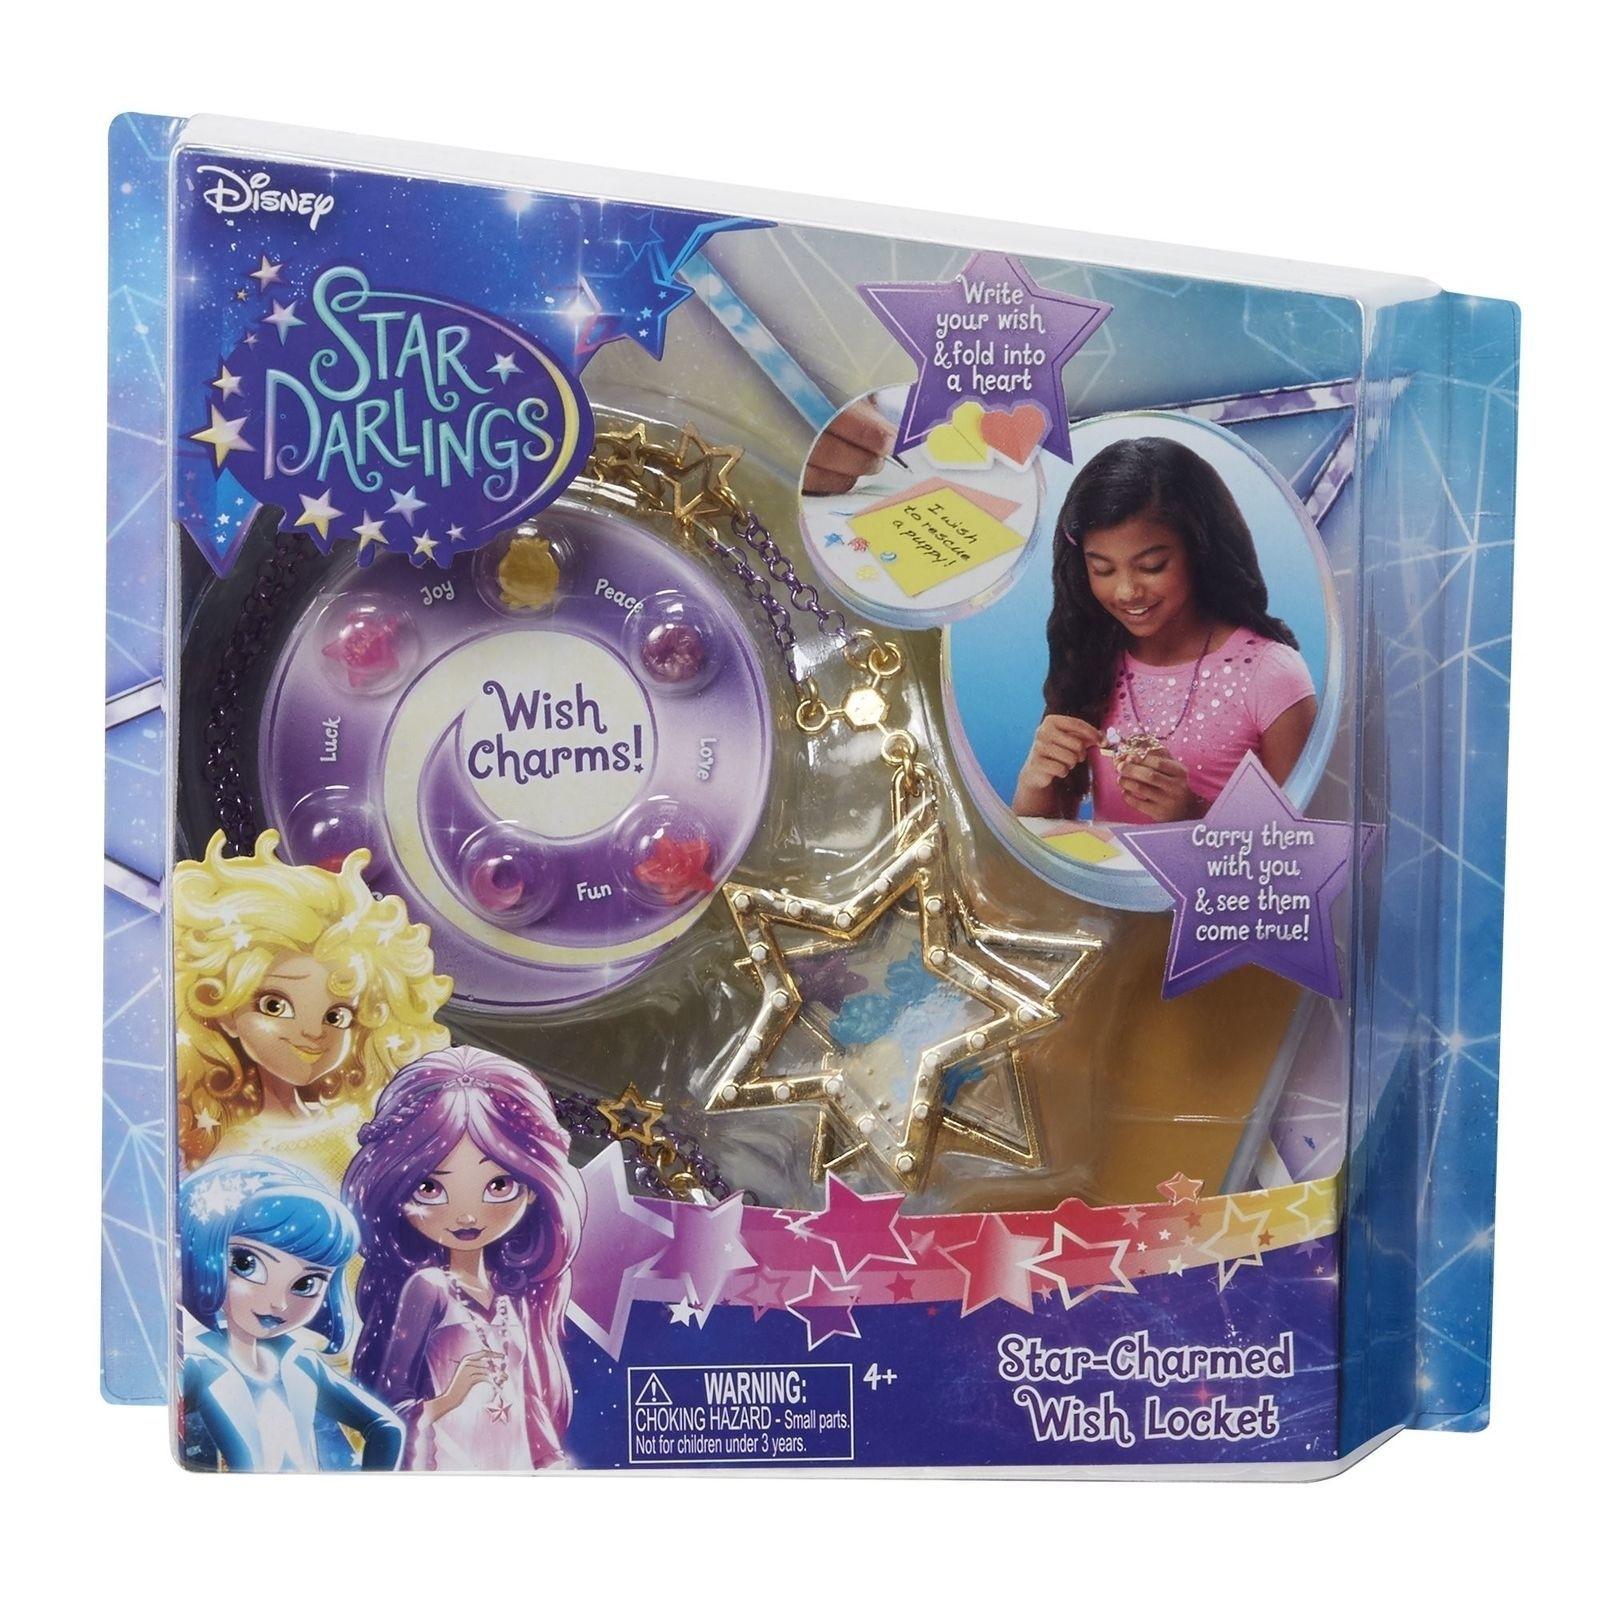 Disney Star Darlings Star-Charmed Wash Locket